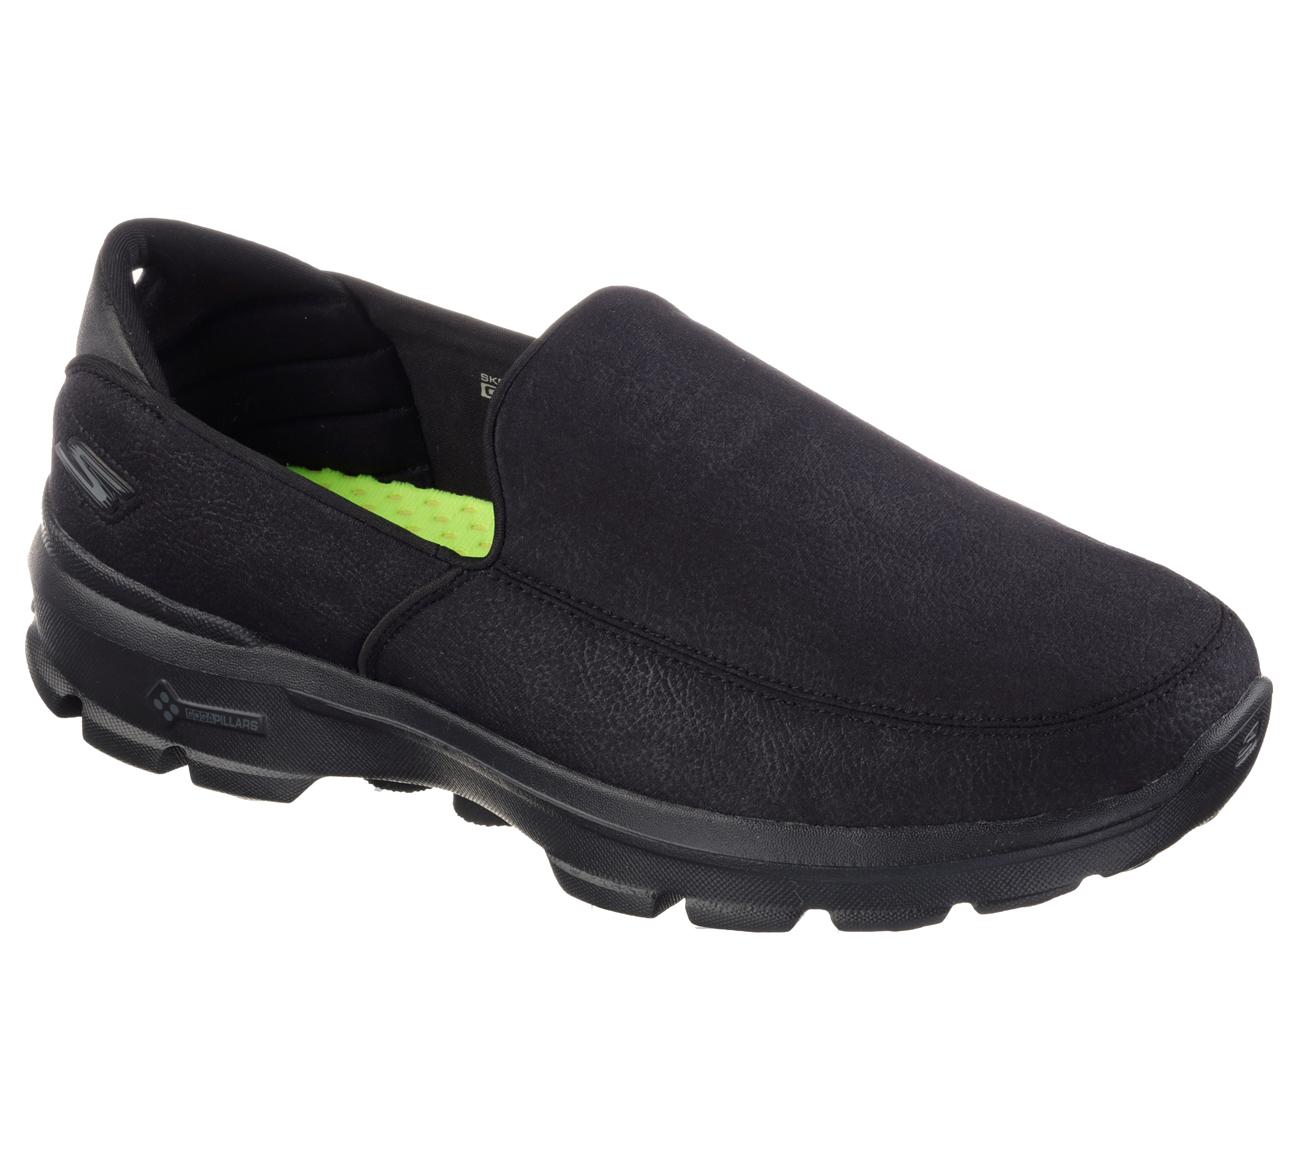 Mens Slip On Walking Shoes Images